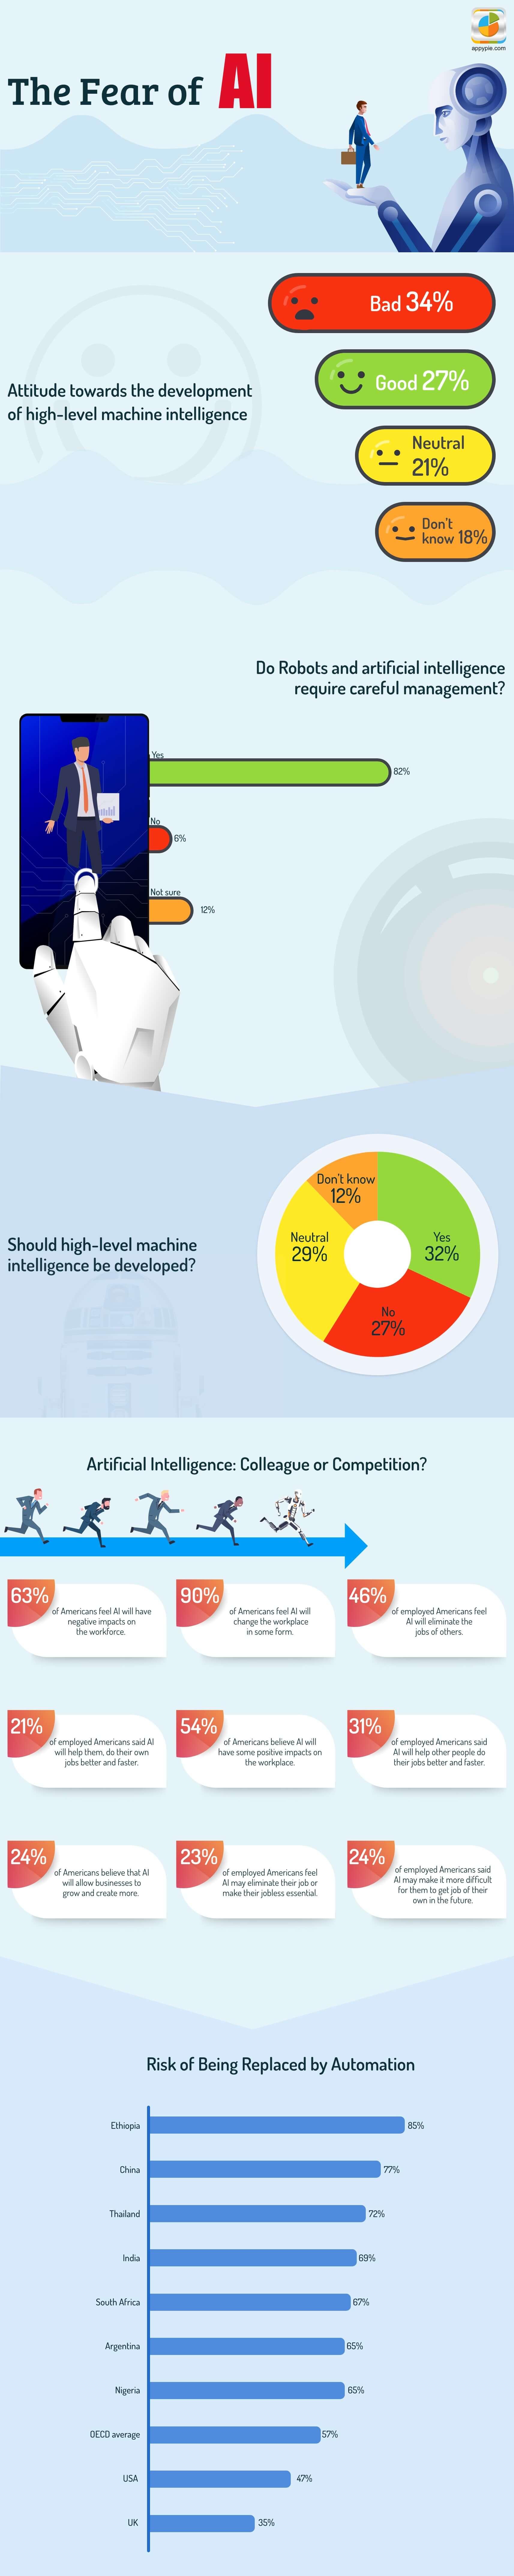 The Fear of AI